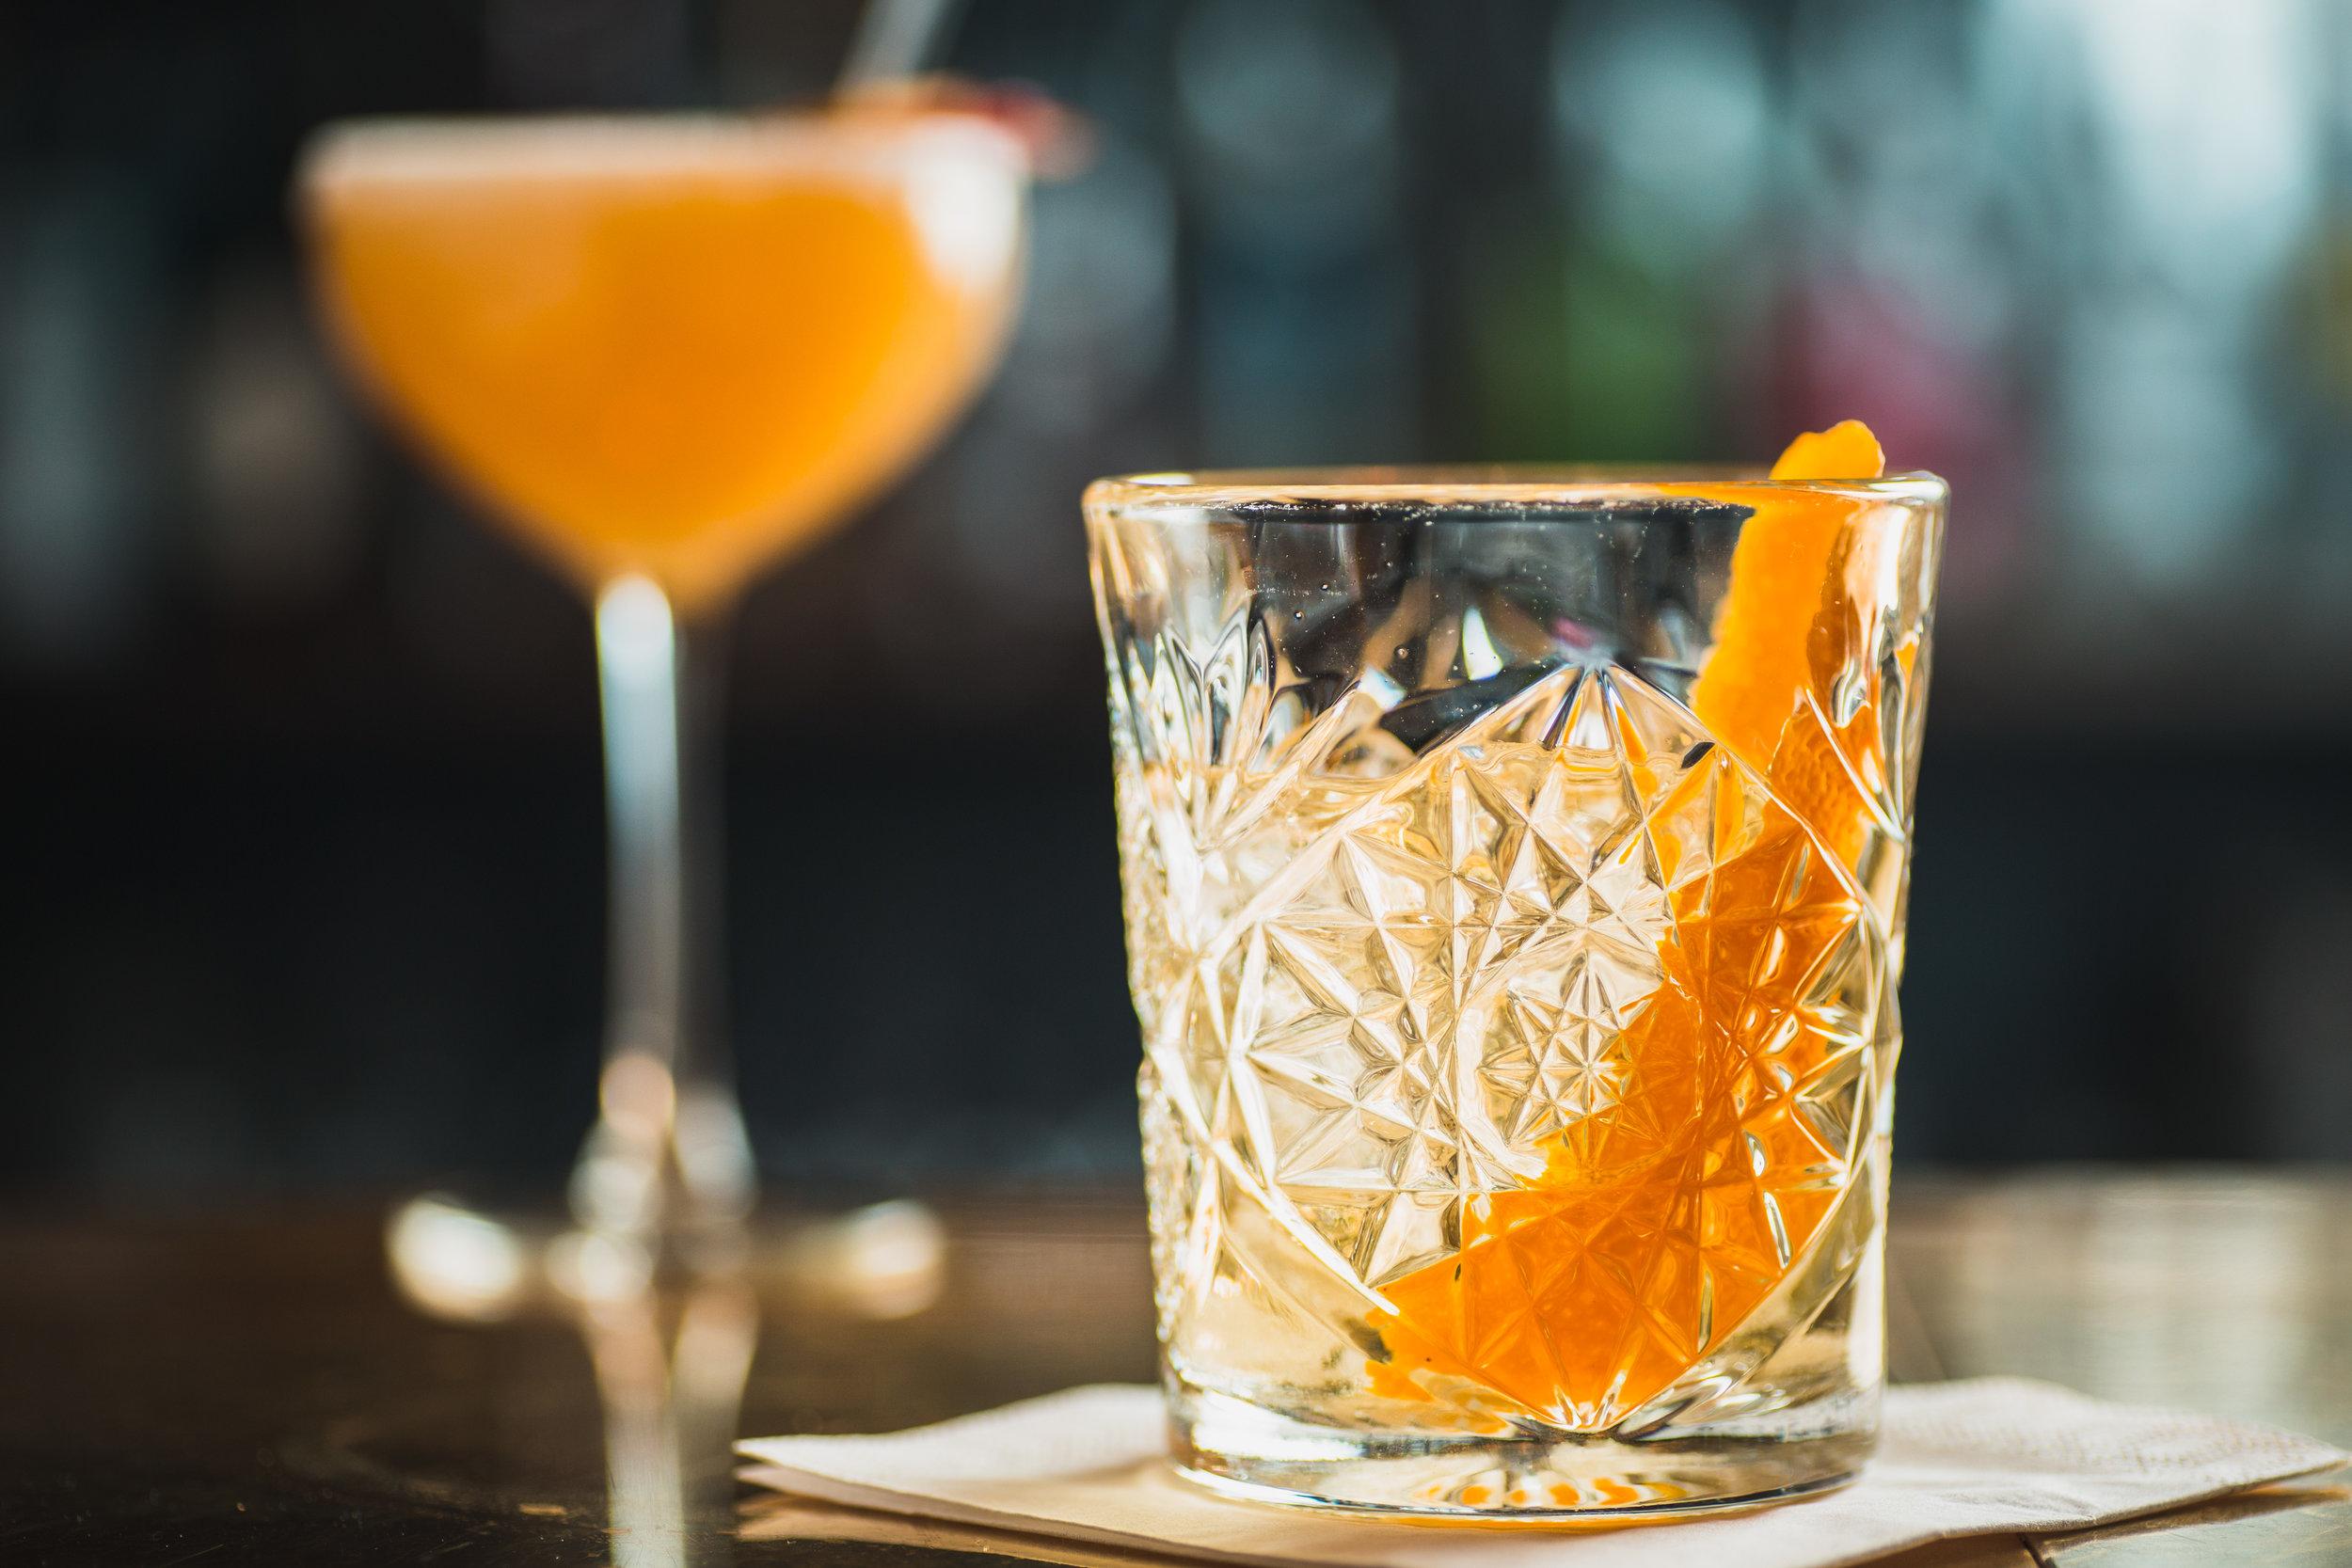 Quality-Hotel-Friends-BrasserieX-orange-bar.jpg